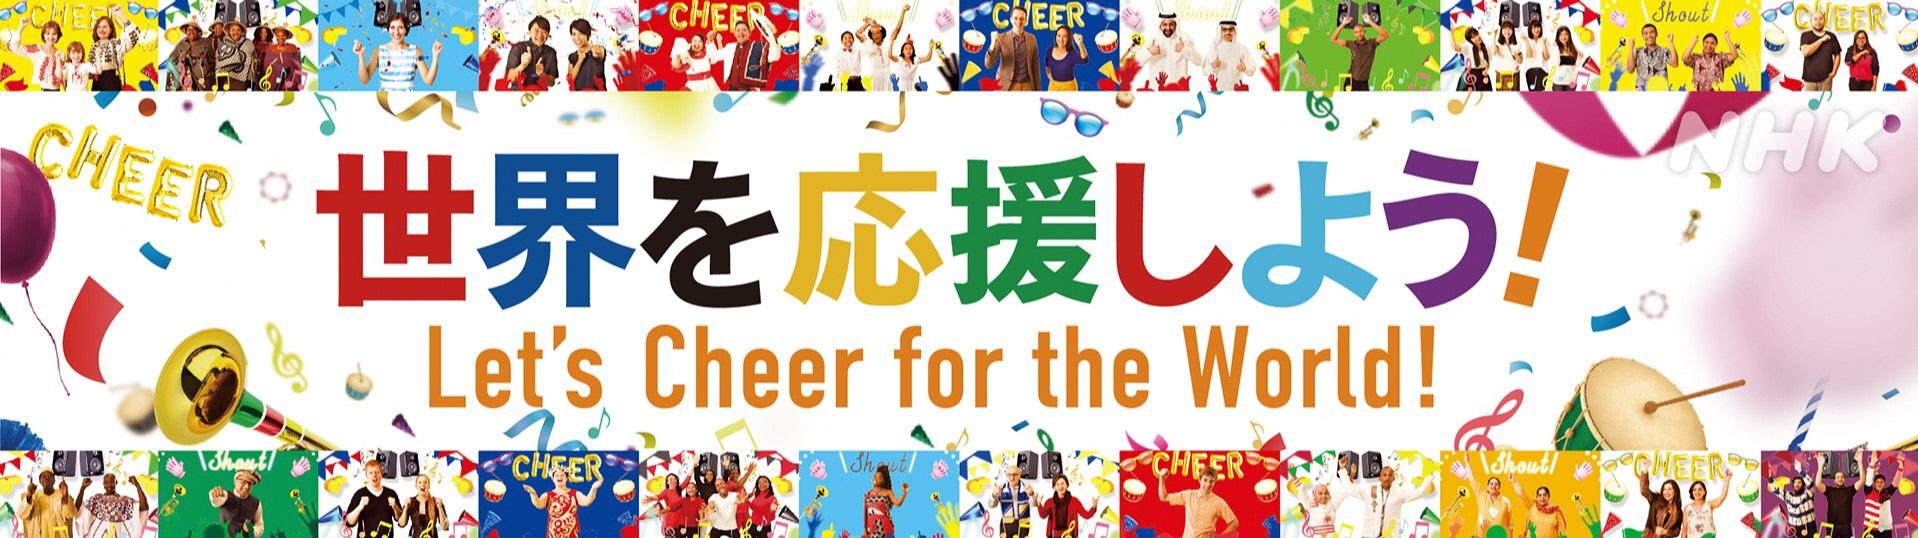 NHK世界を応援しよう